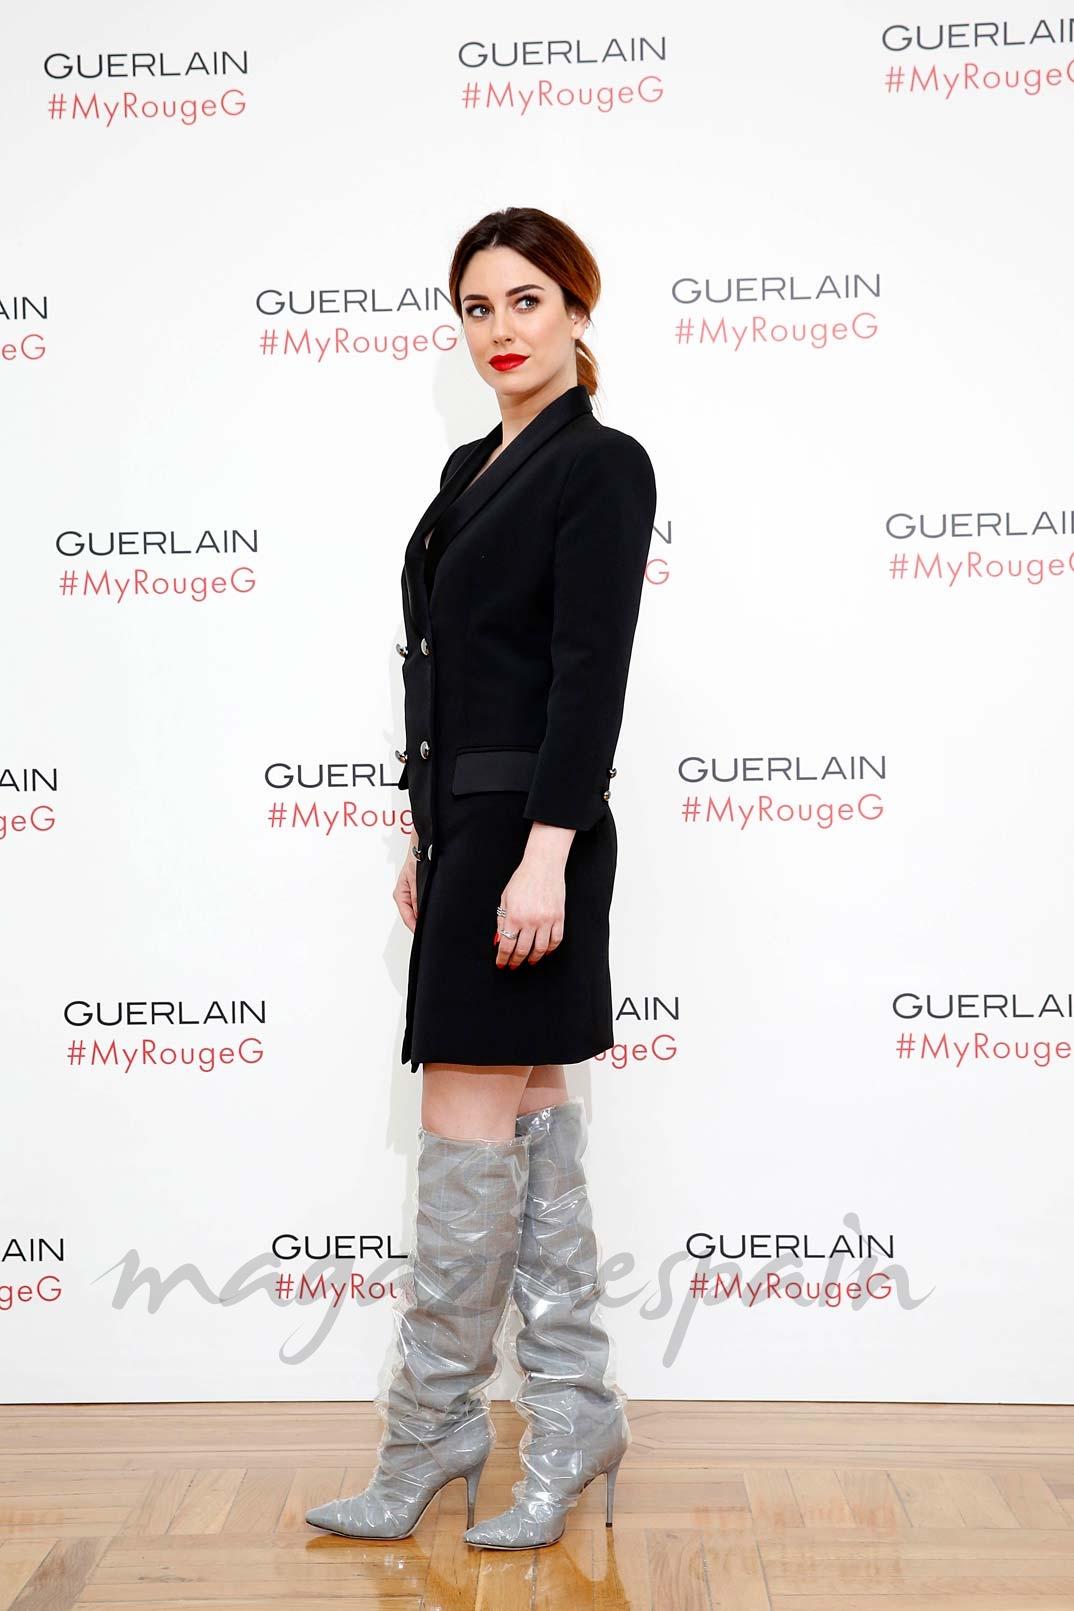 Blanca Suárez - Guerlain